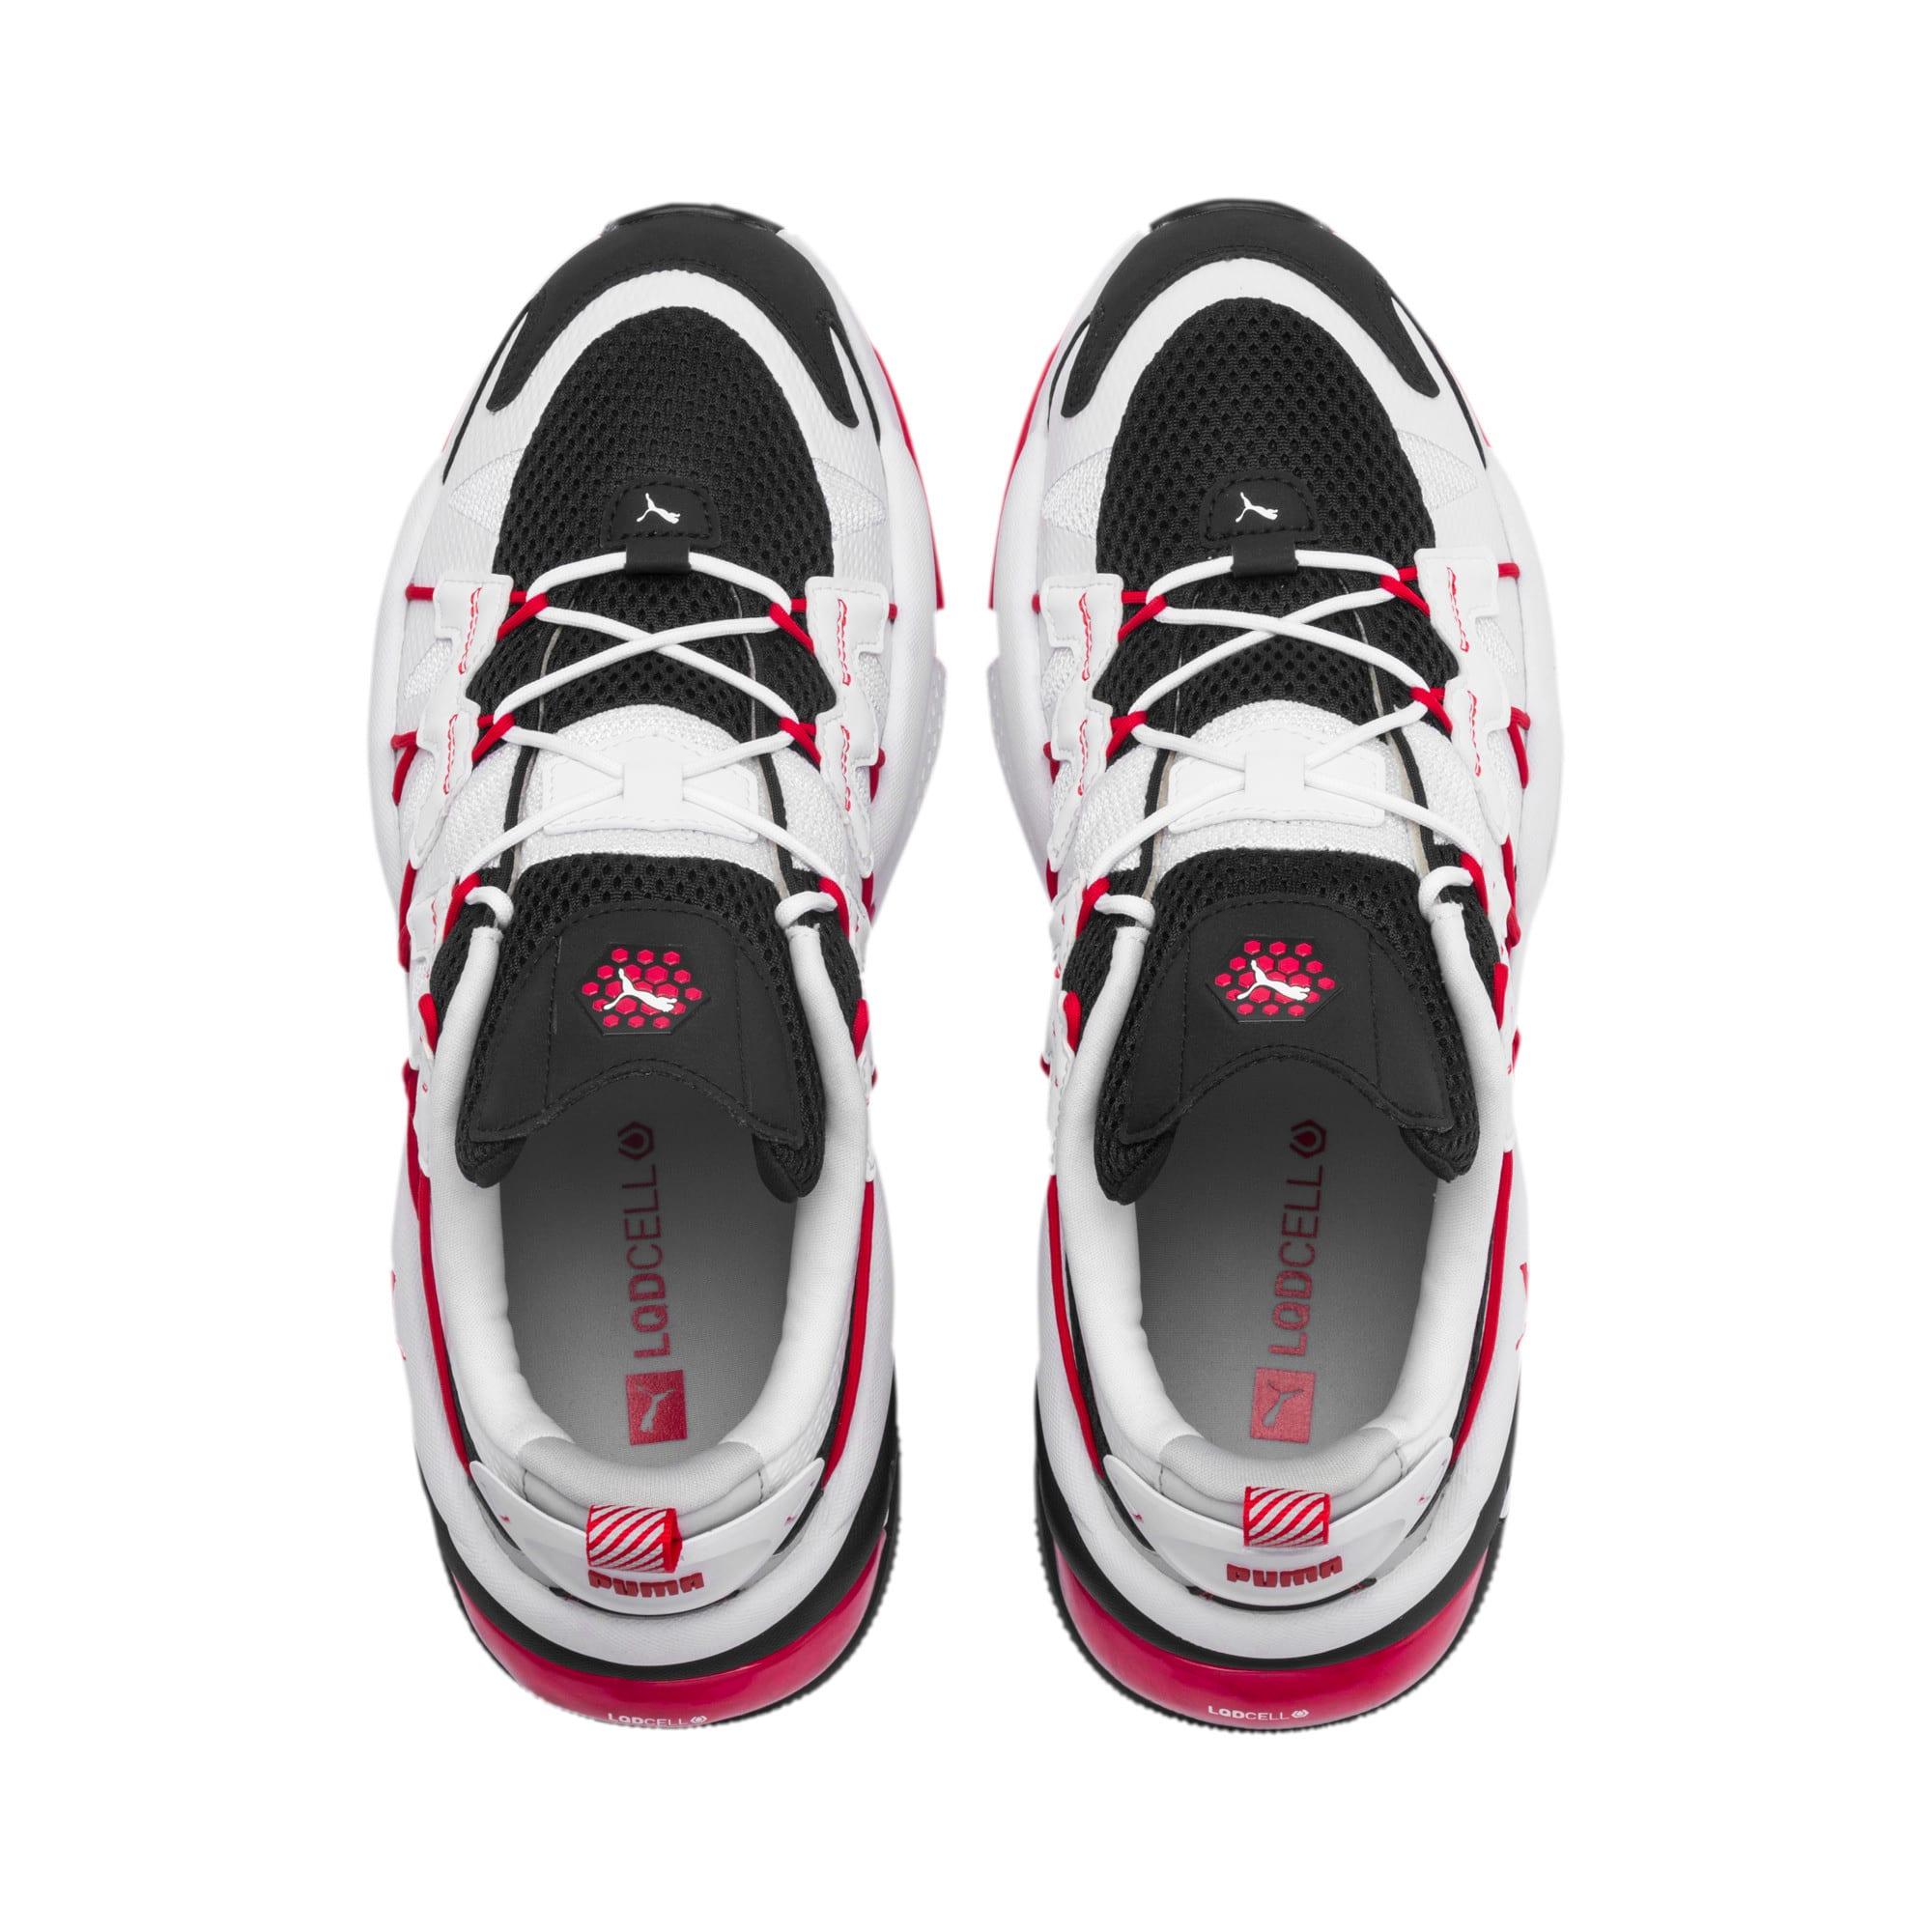 Thumbnail 6 of LQDCELL Omega Training Shoes, Puma Black-Puma White, medium